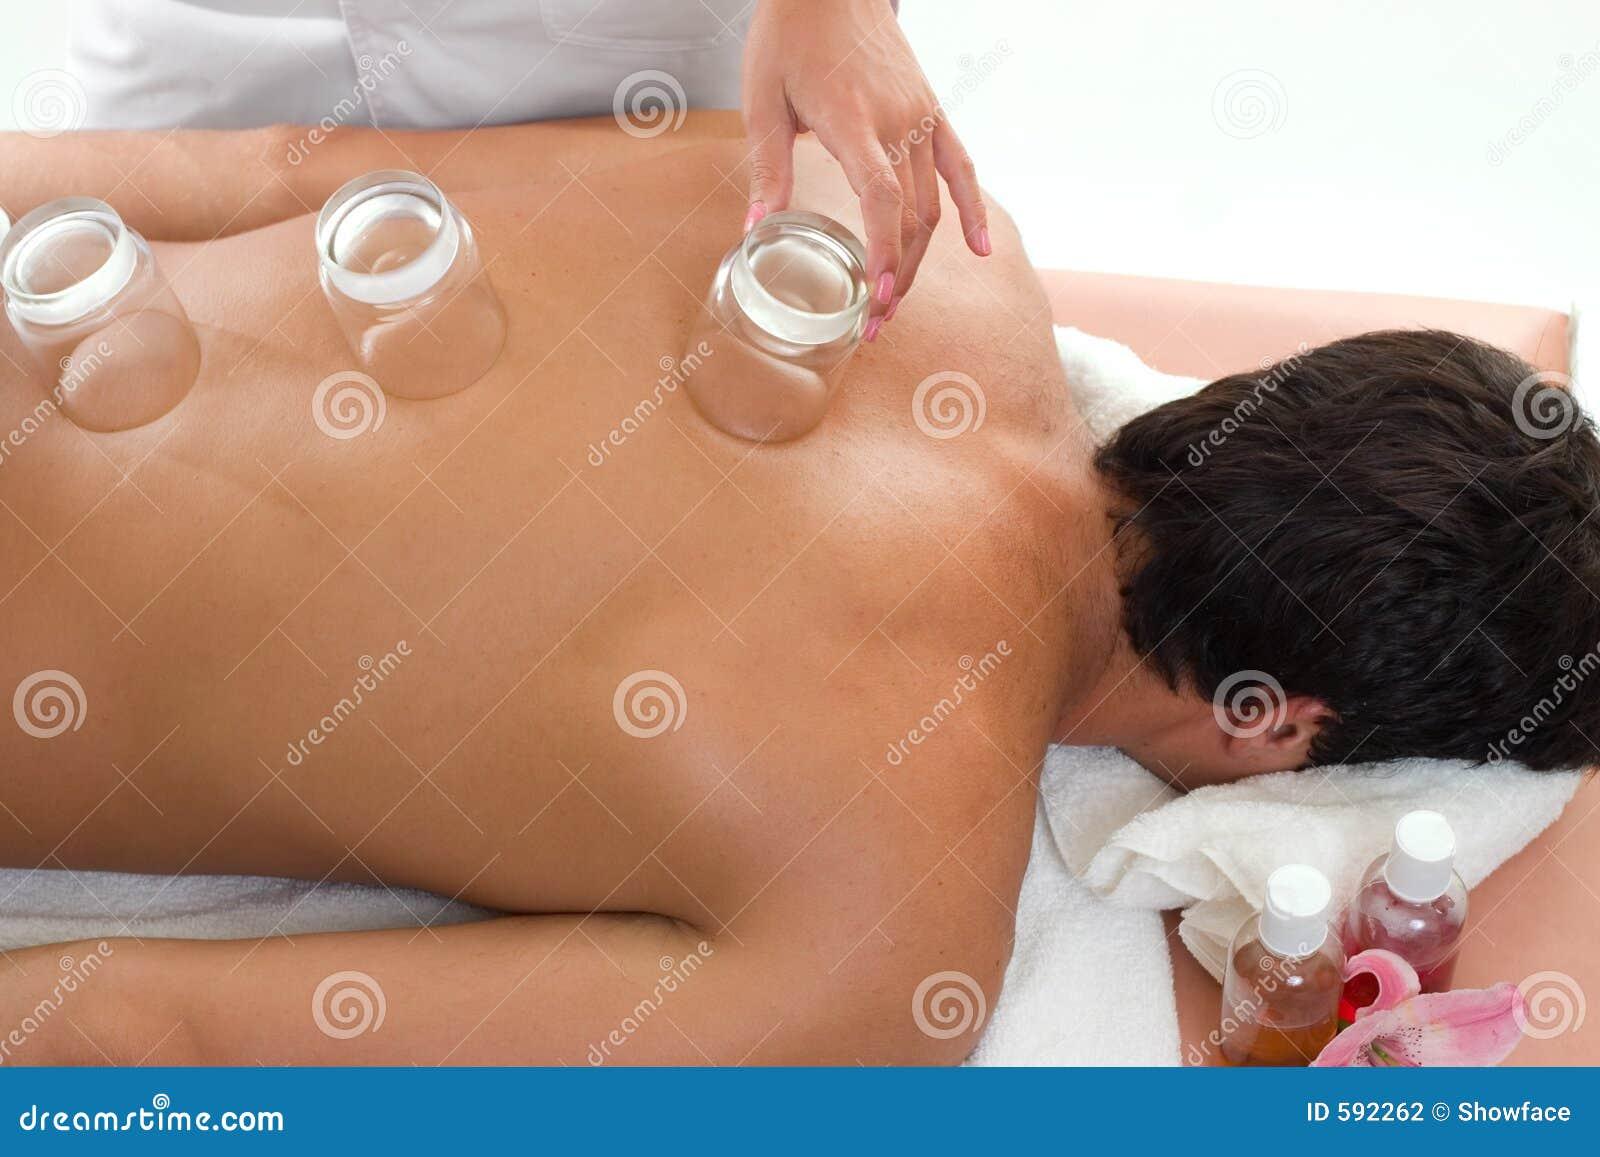 therapeutic massage pamper time healing amazing relaxation asian